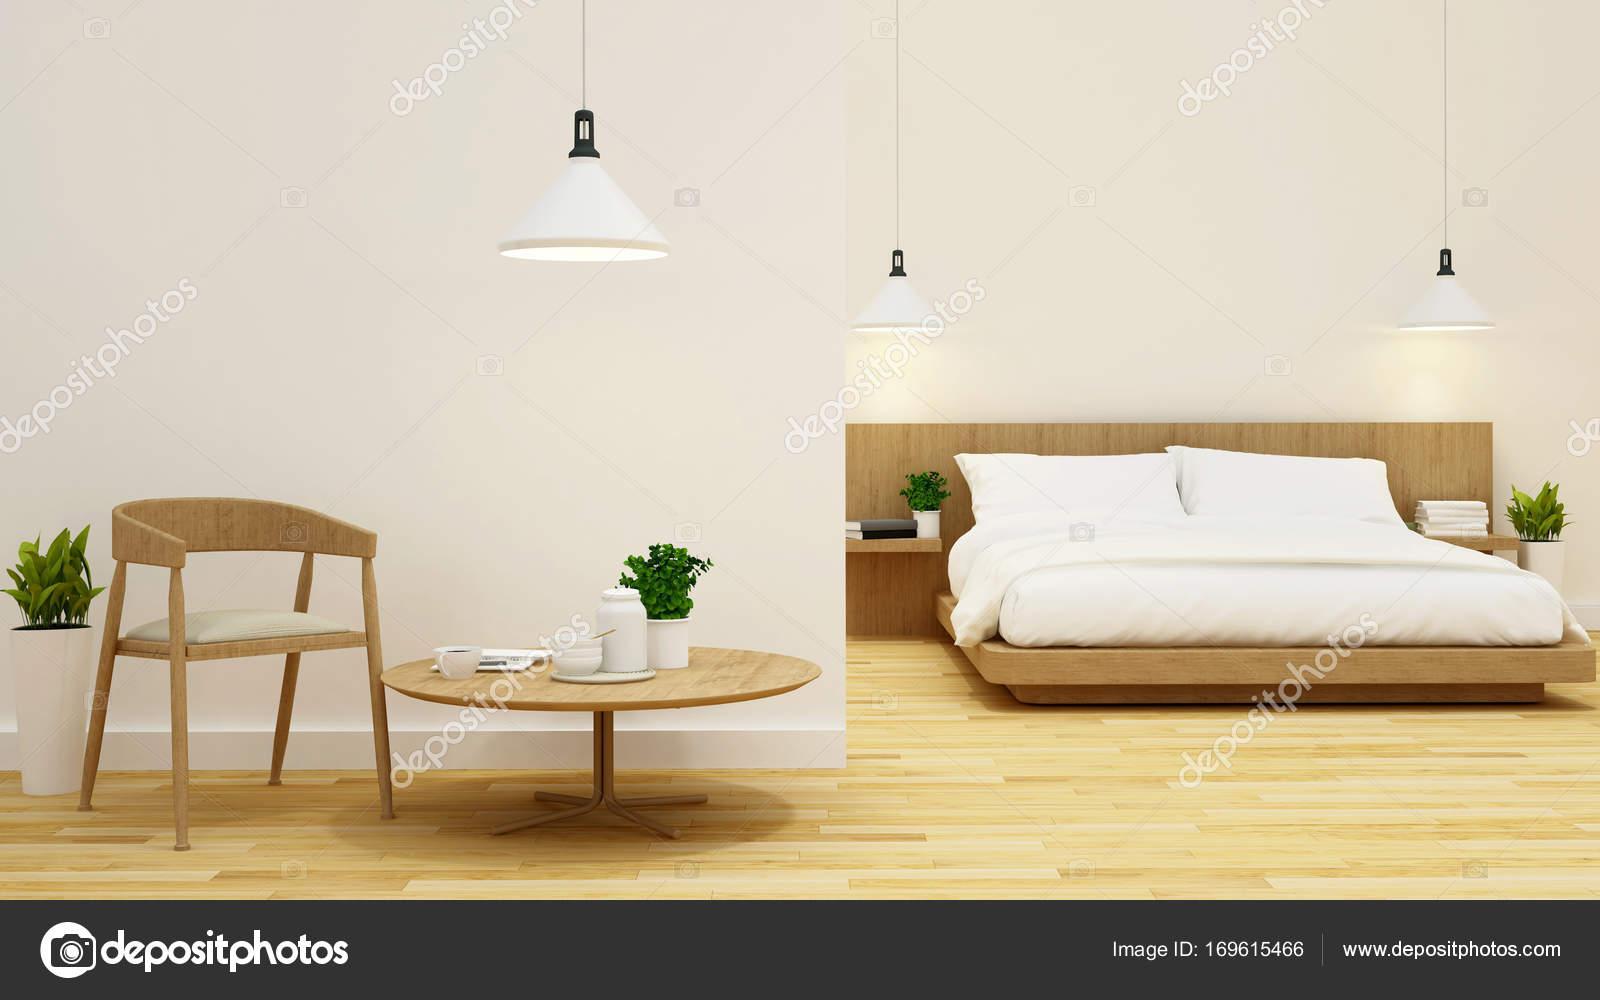 slaapkamer en woonkamer schoon ontwerp-3d rendering — Stockfoto ...